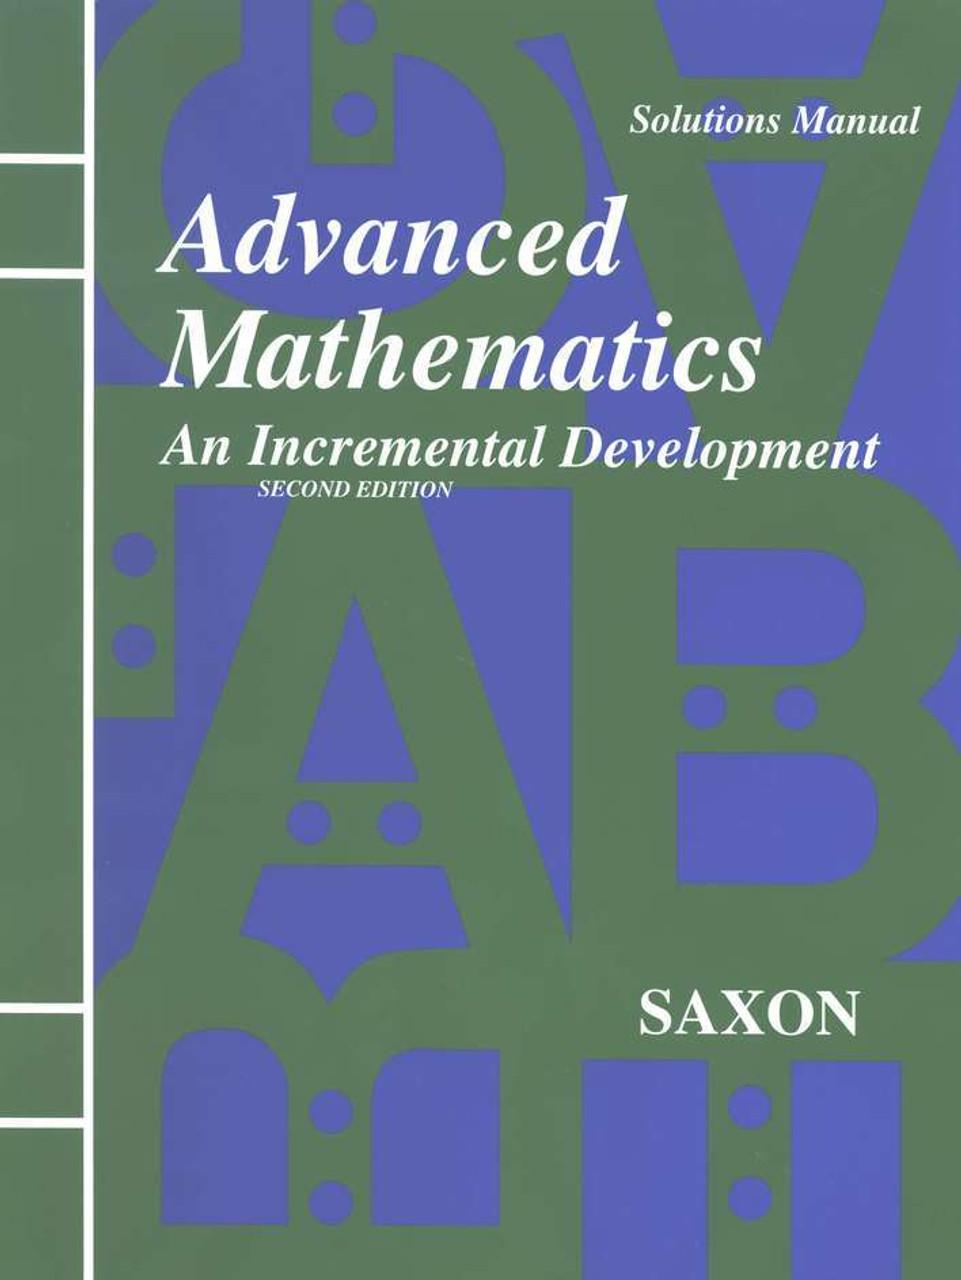 Saxon Advanced Mathematics - Solutions Manual